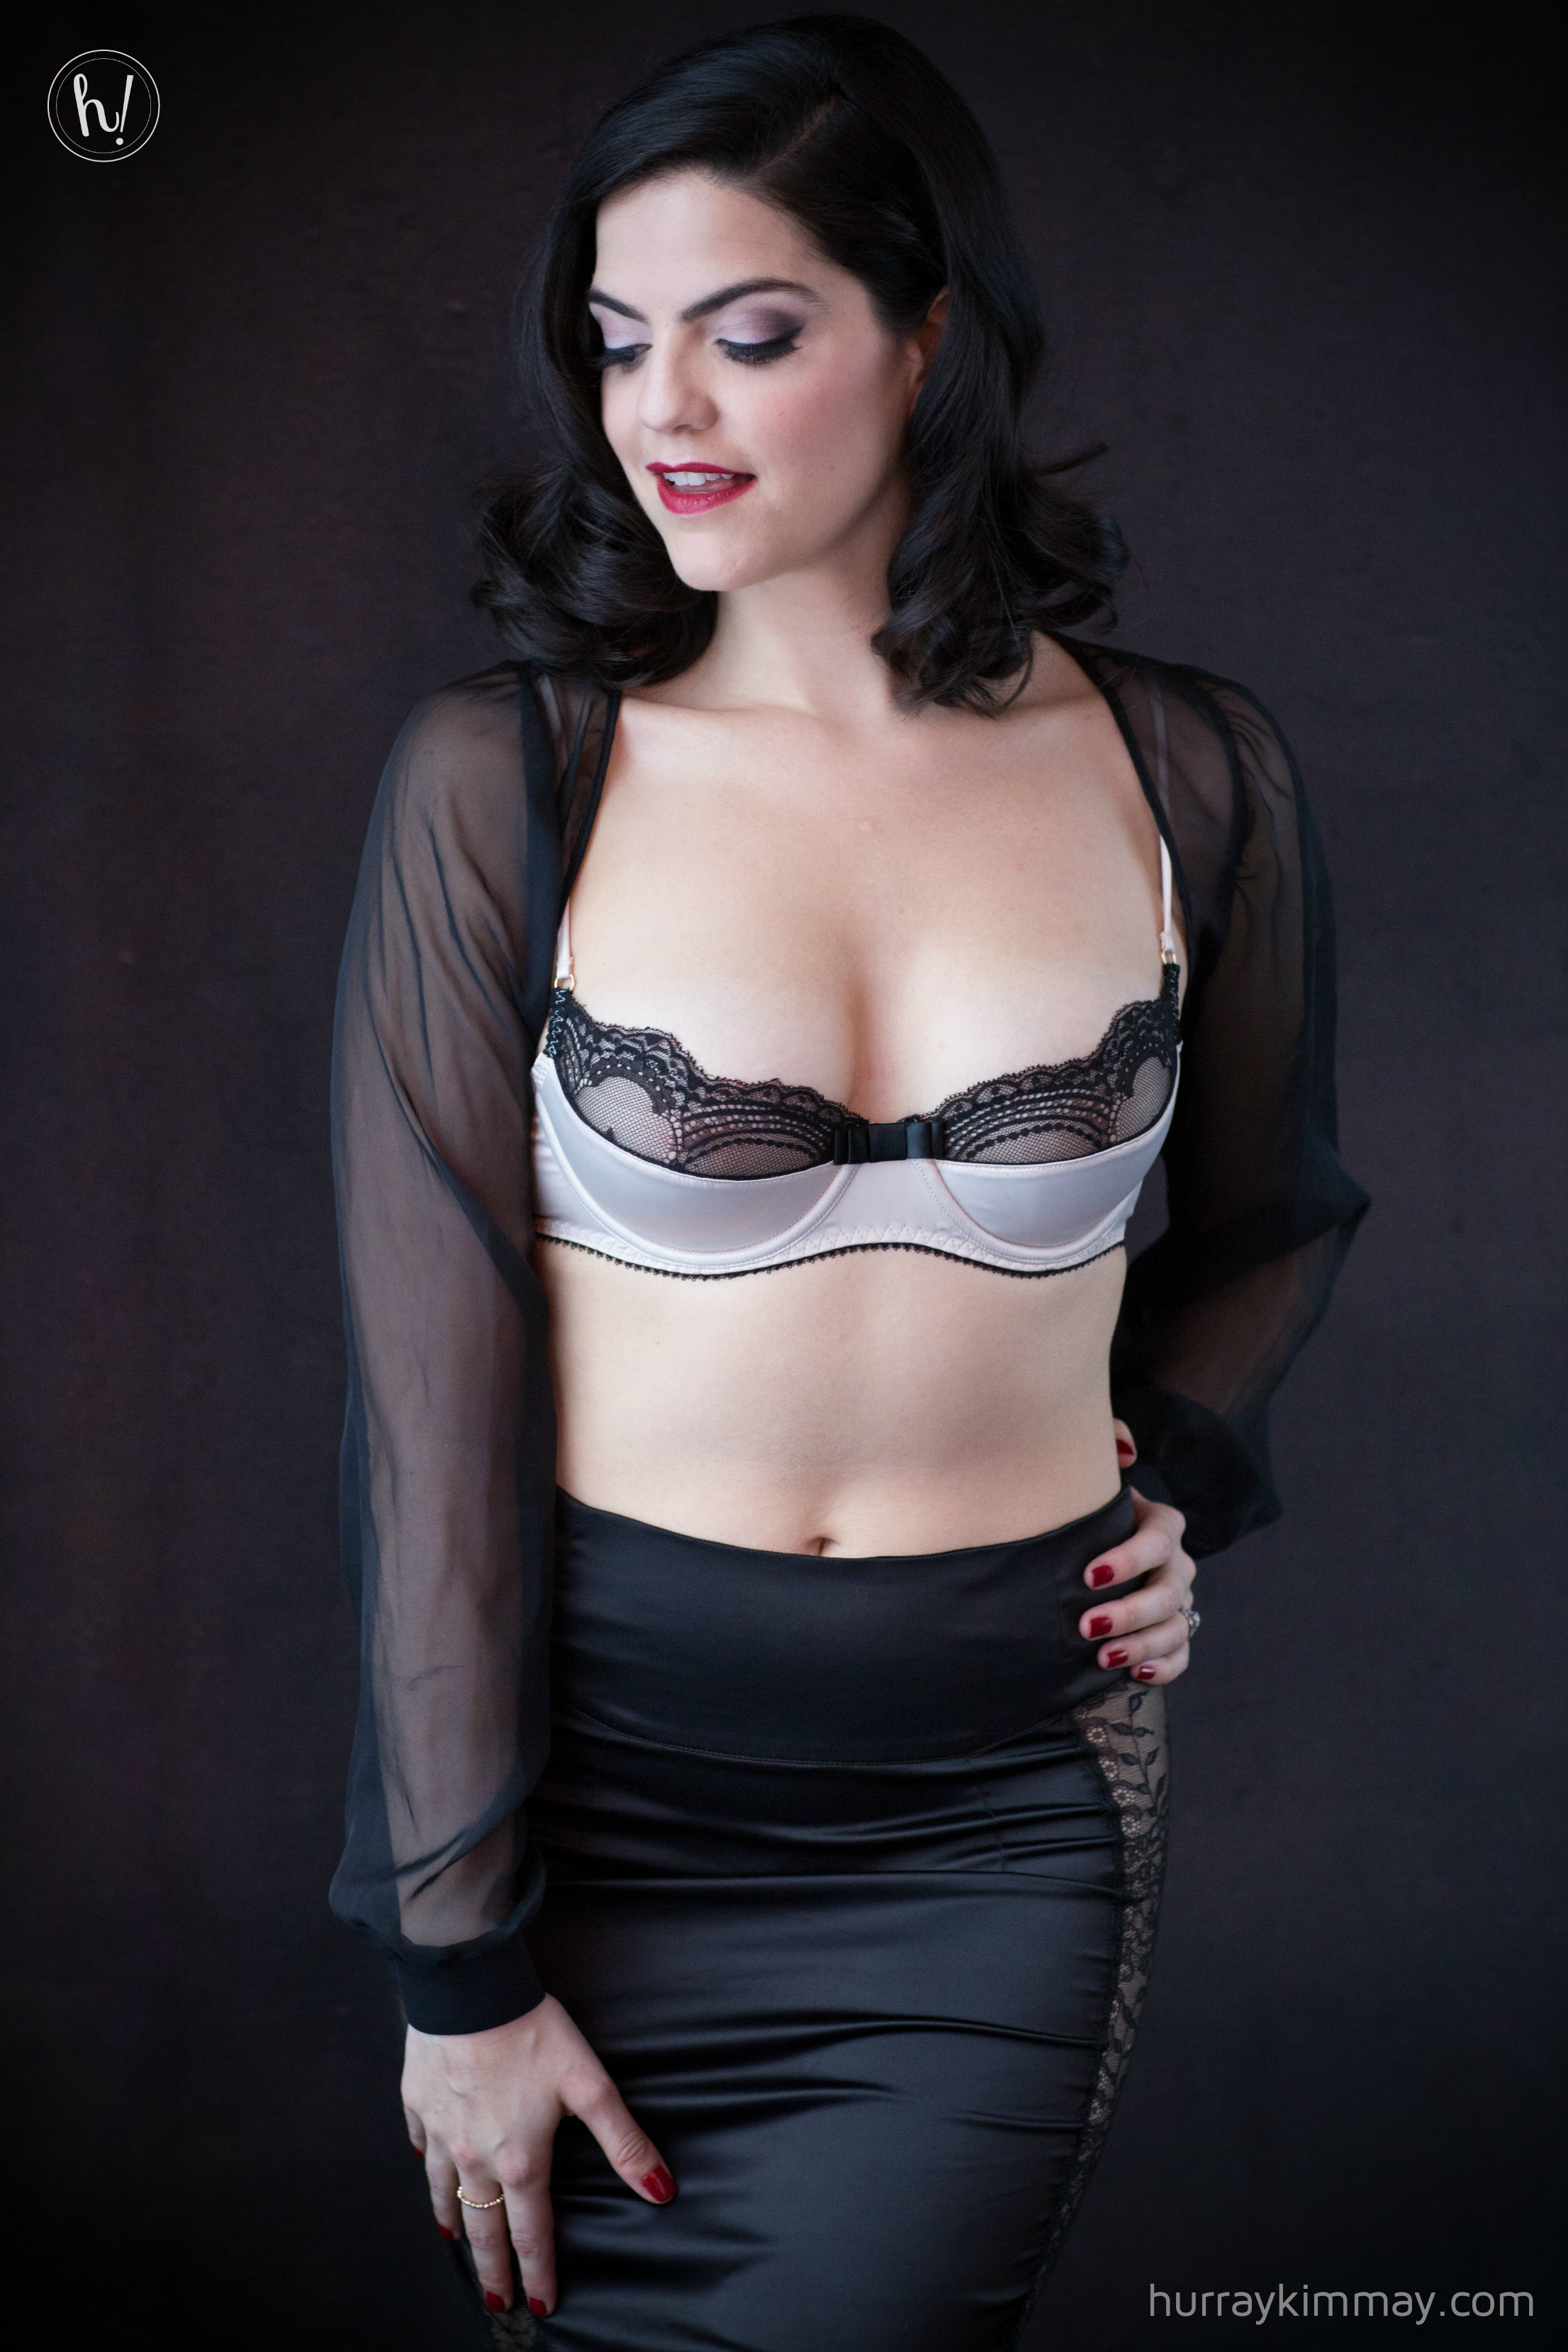 Kimmay wearing Maison Close quarter bra bolero and slip